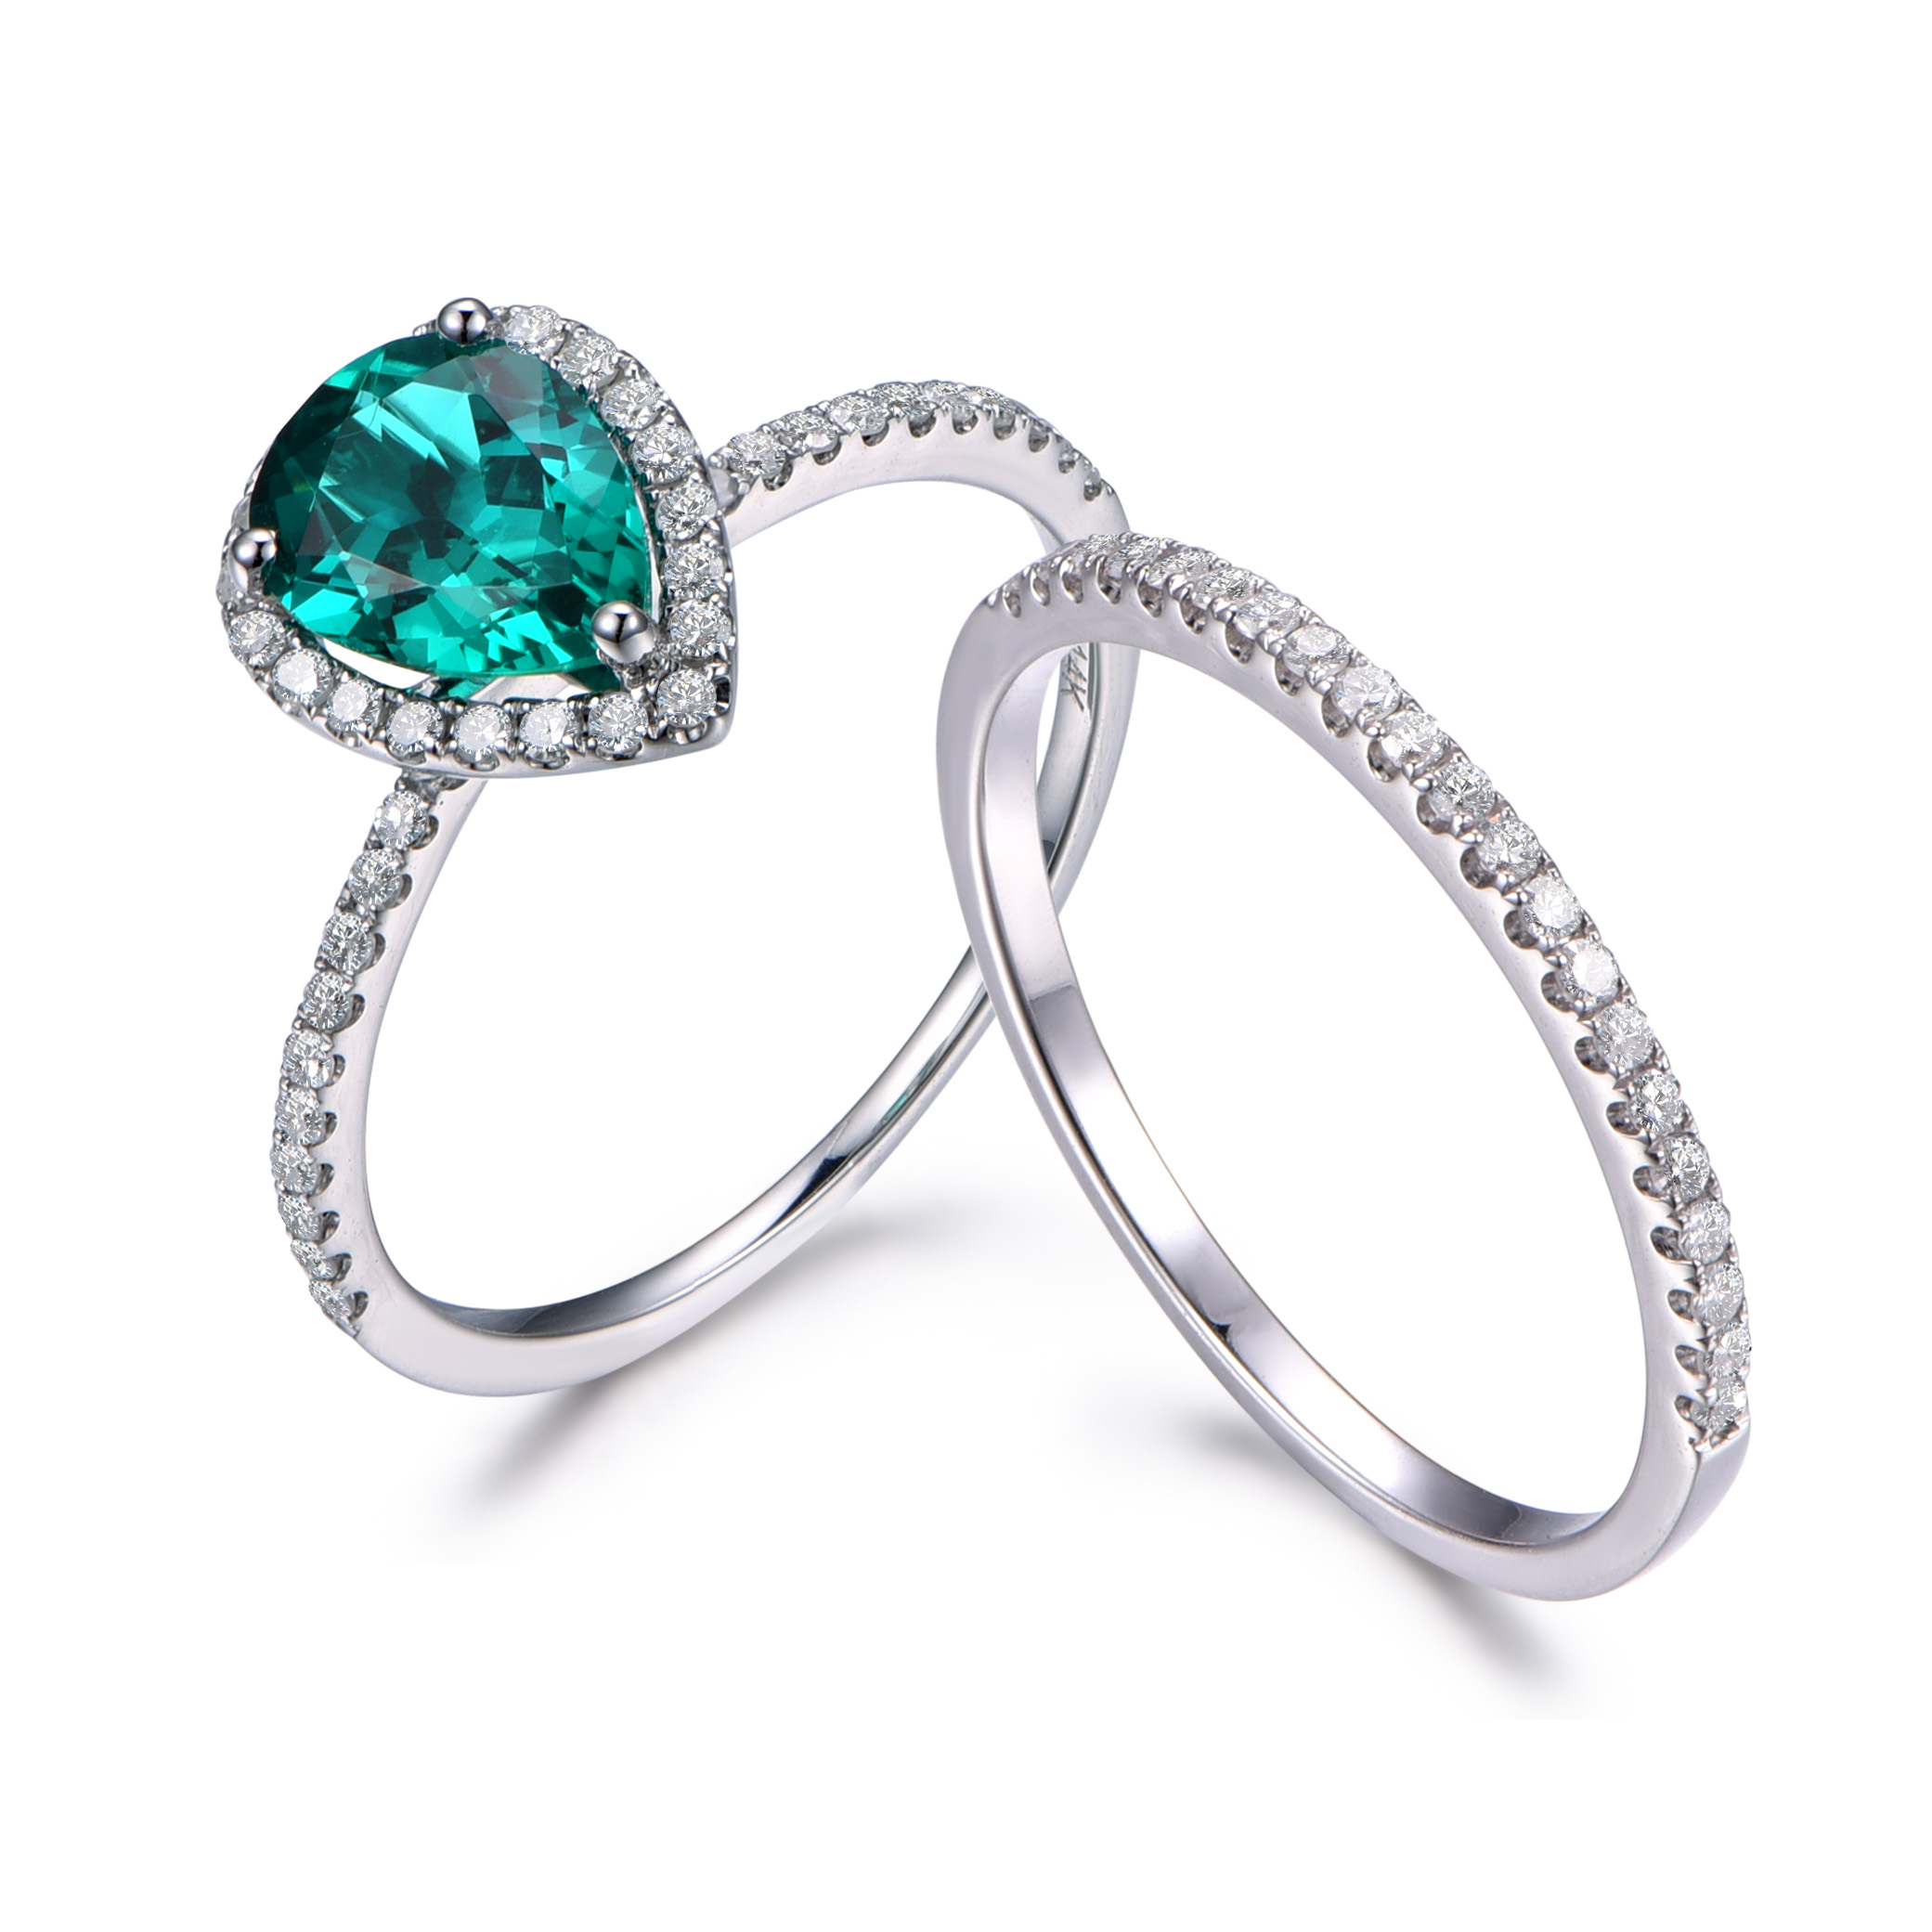 New Wedding Ring Sets Pear Shaped Diamond